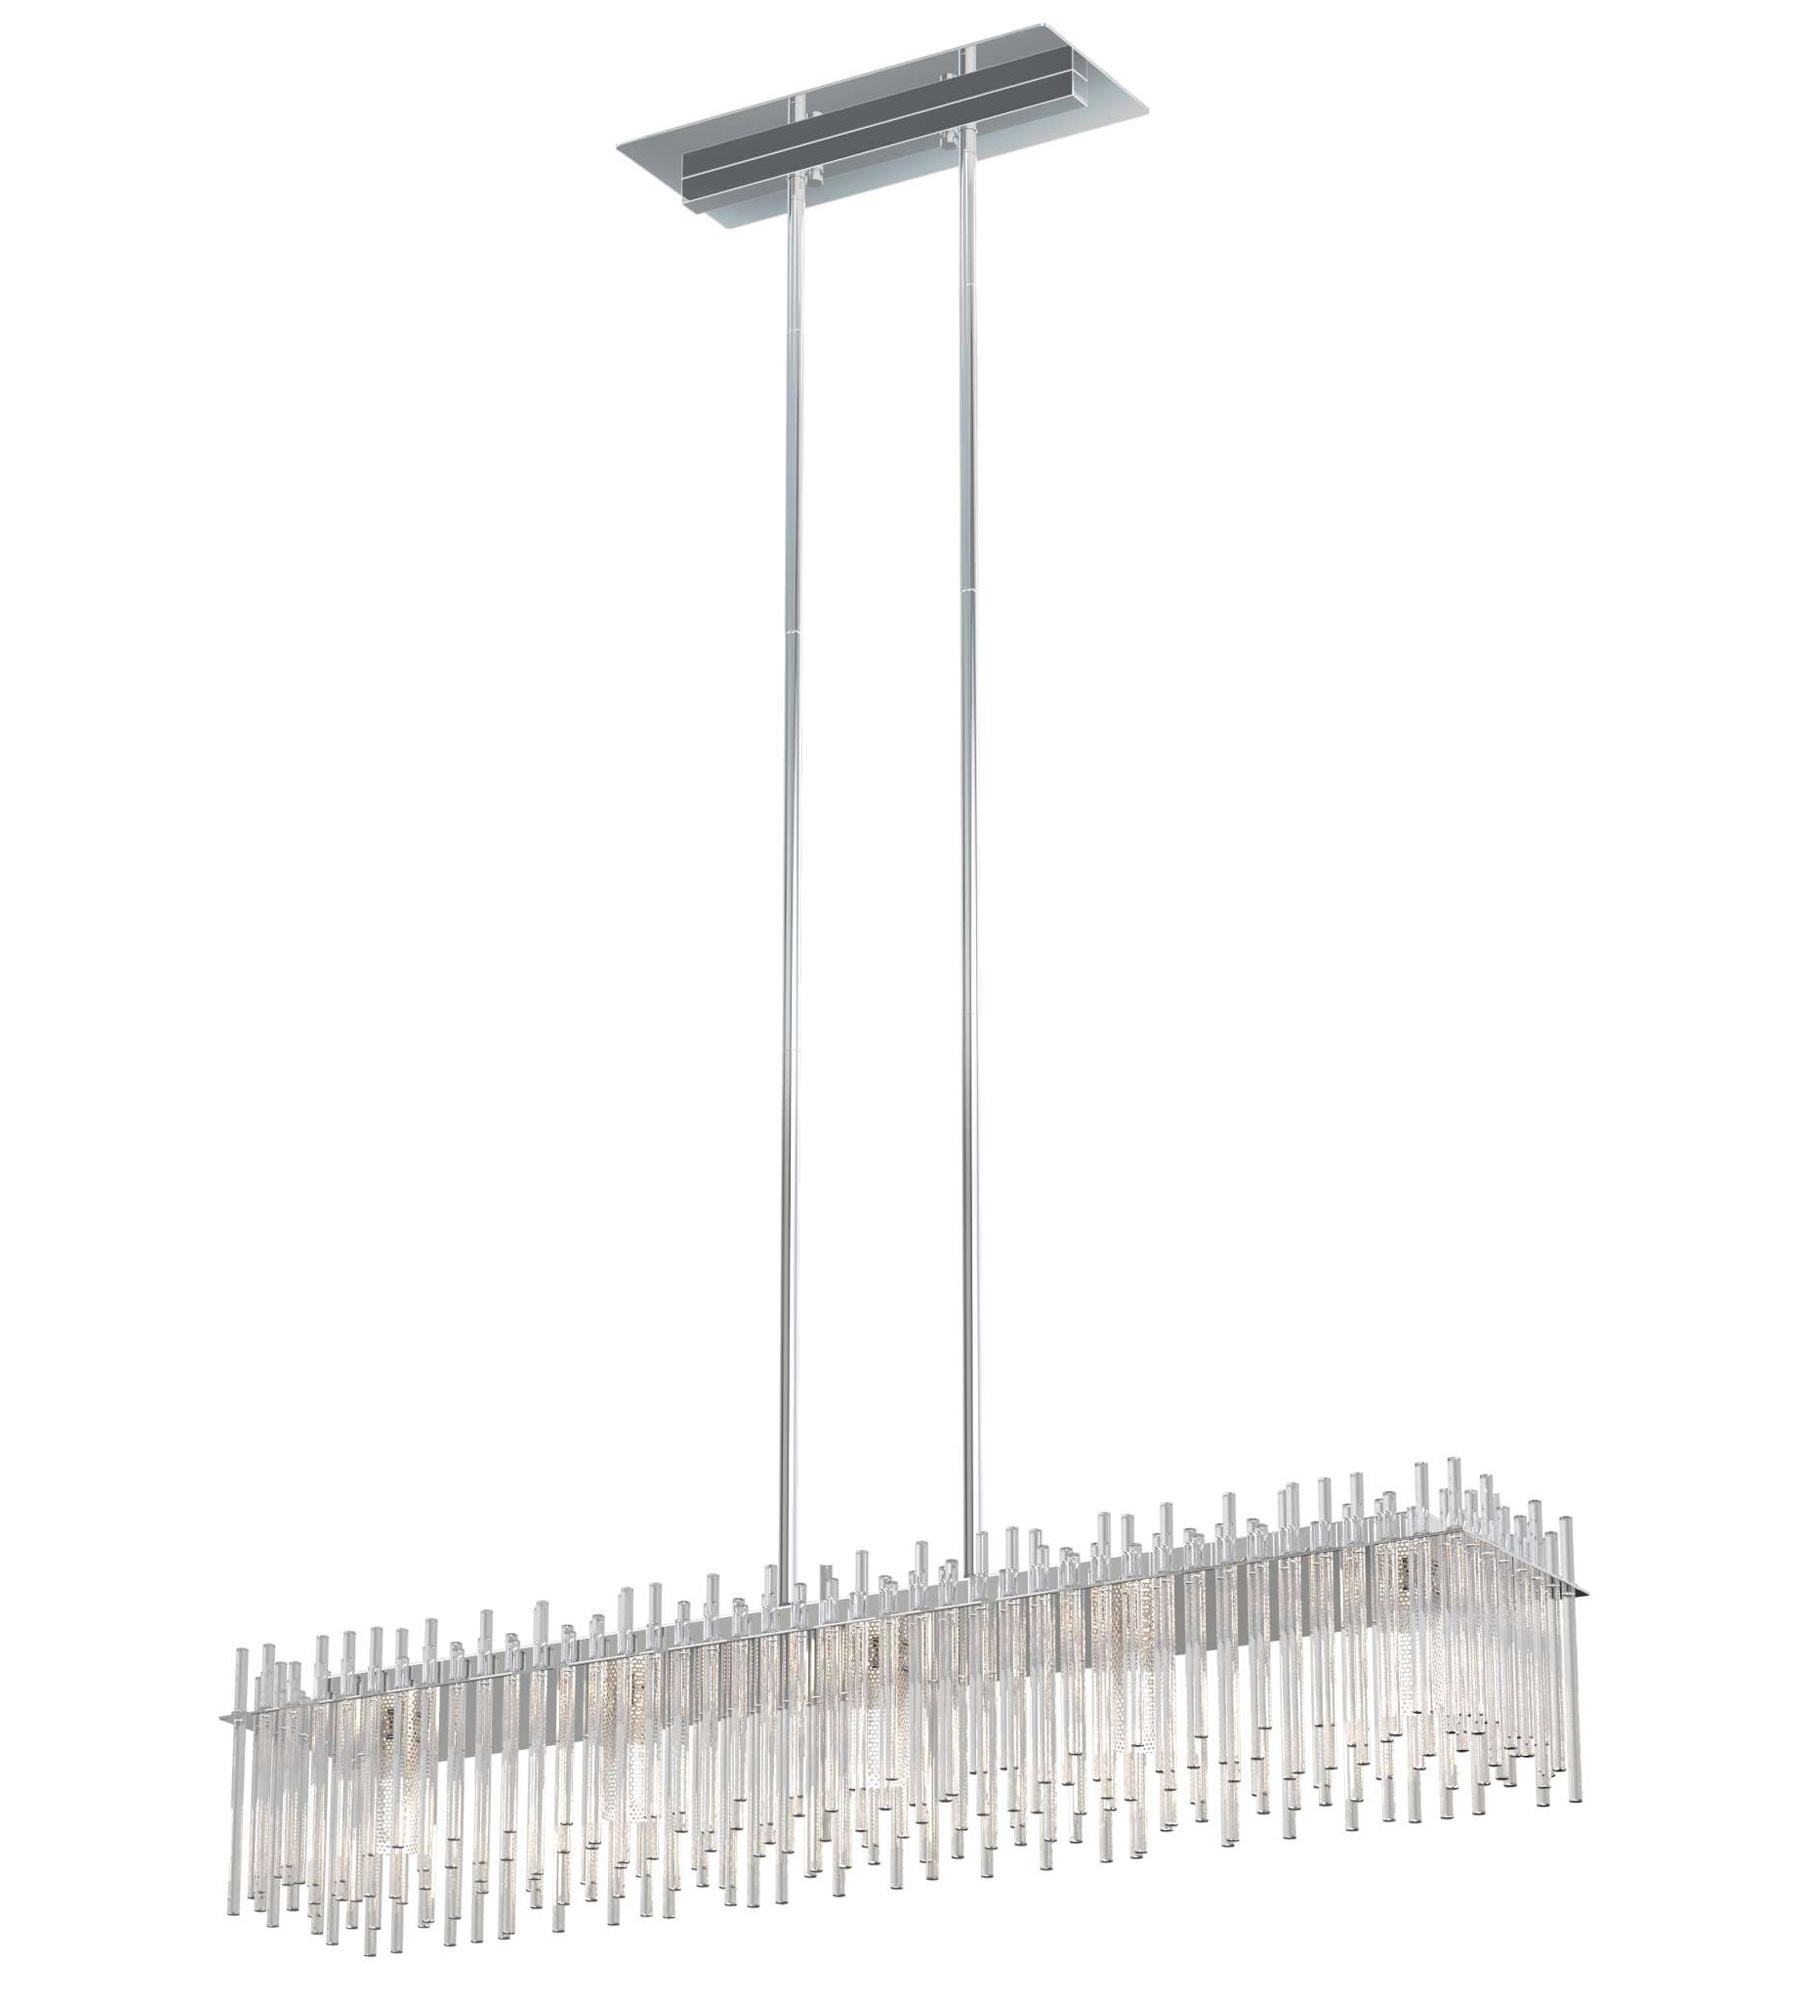 Swizzle Pendant by DVI Lighting | DVP23402-CH-CRY  sc 1 st  Lightology & Pendant by DVI Lighting | DVP23402-CH-CRY azcodes.com